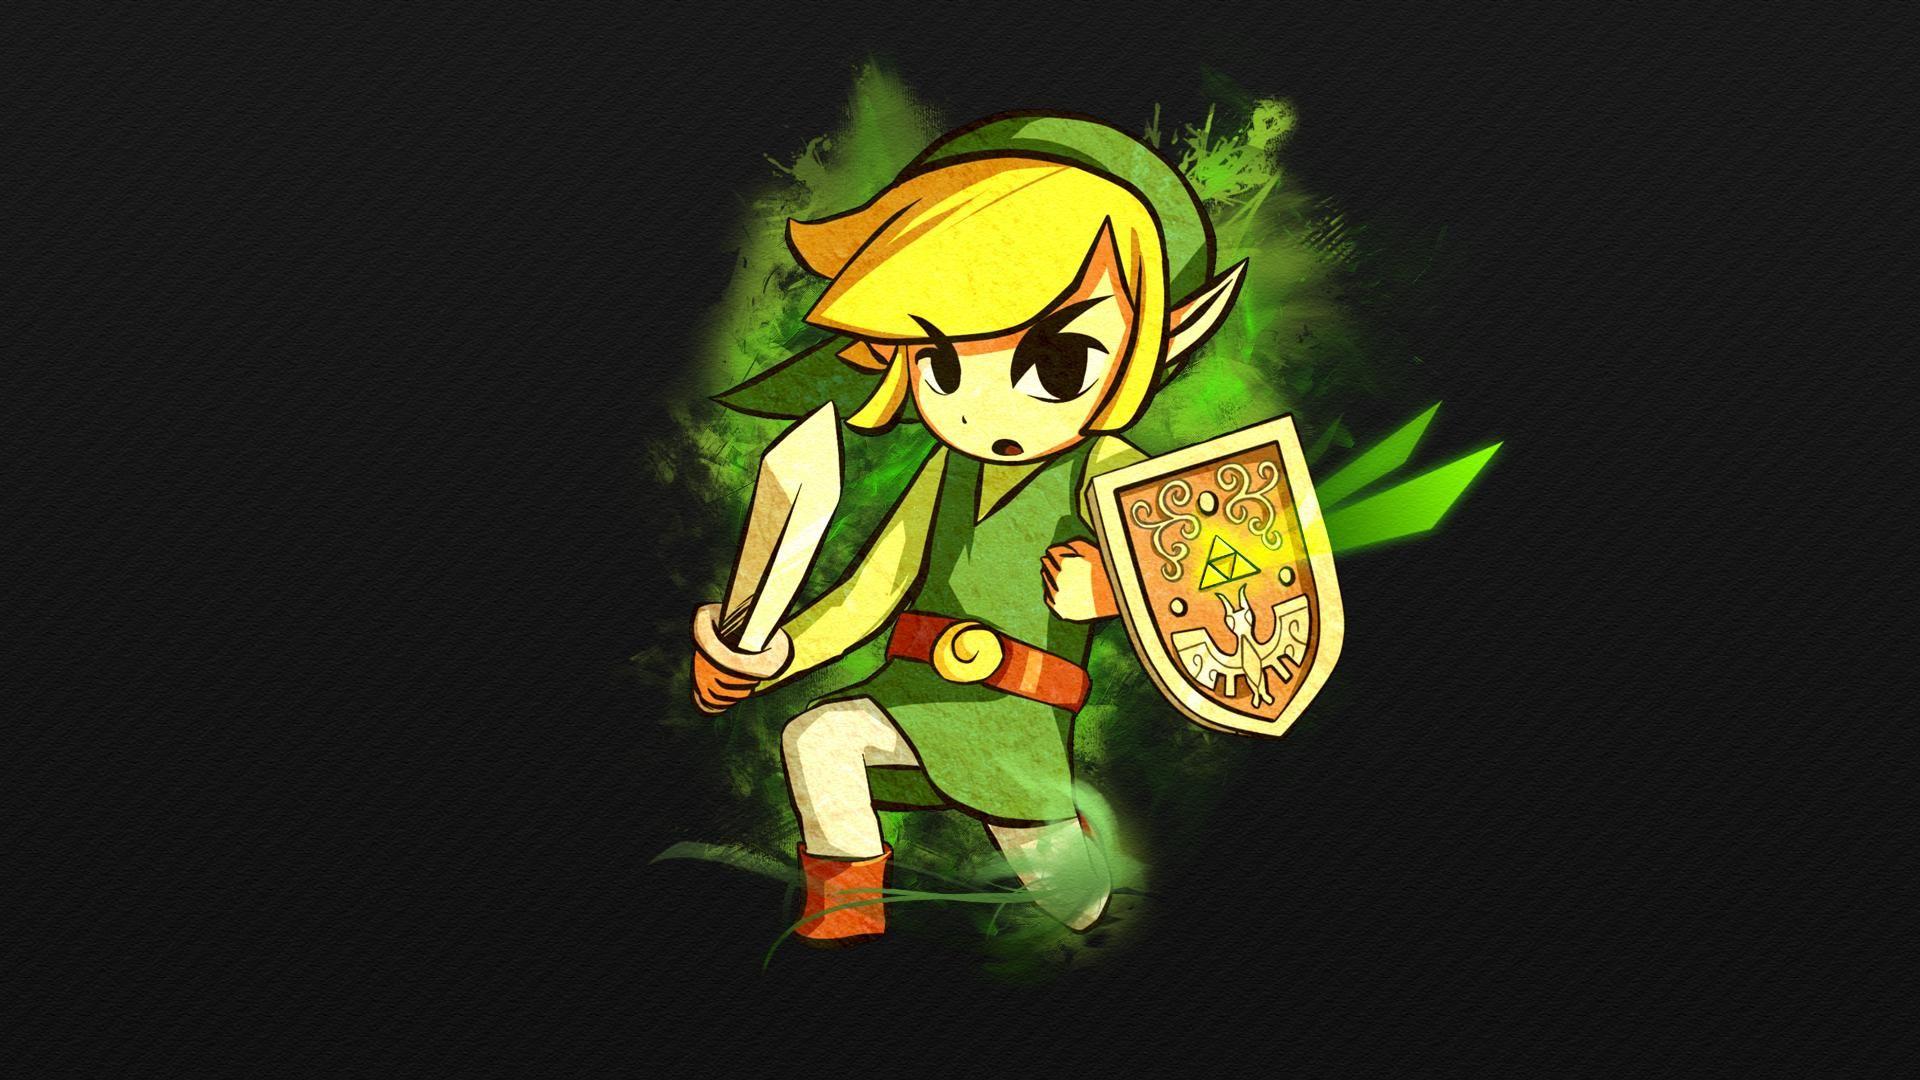 Pin By Jenny Torres On Zelda Legend Of Zelda Wind Waker